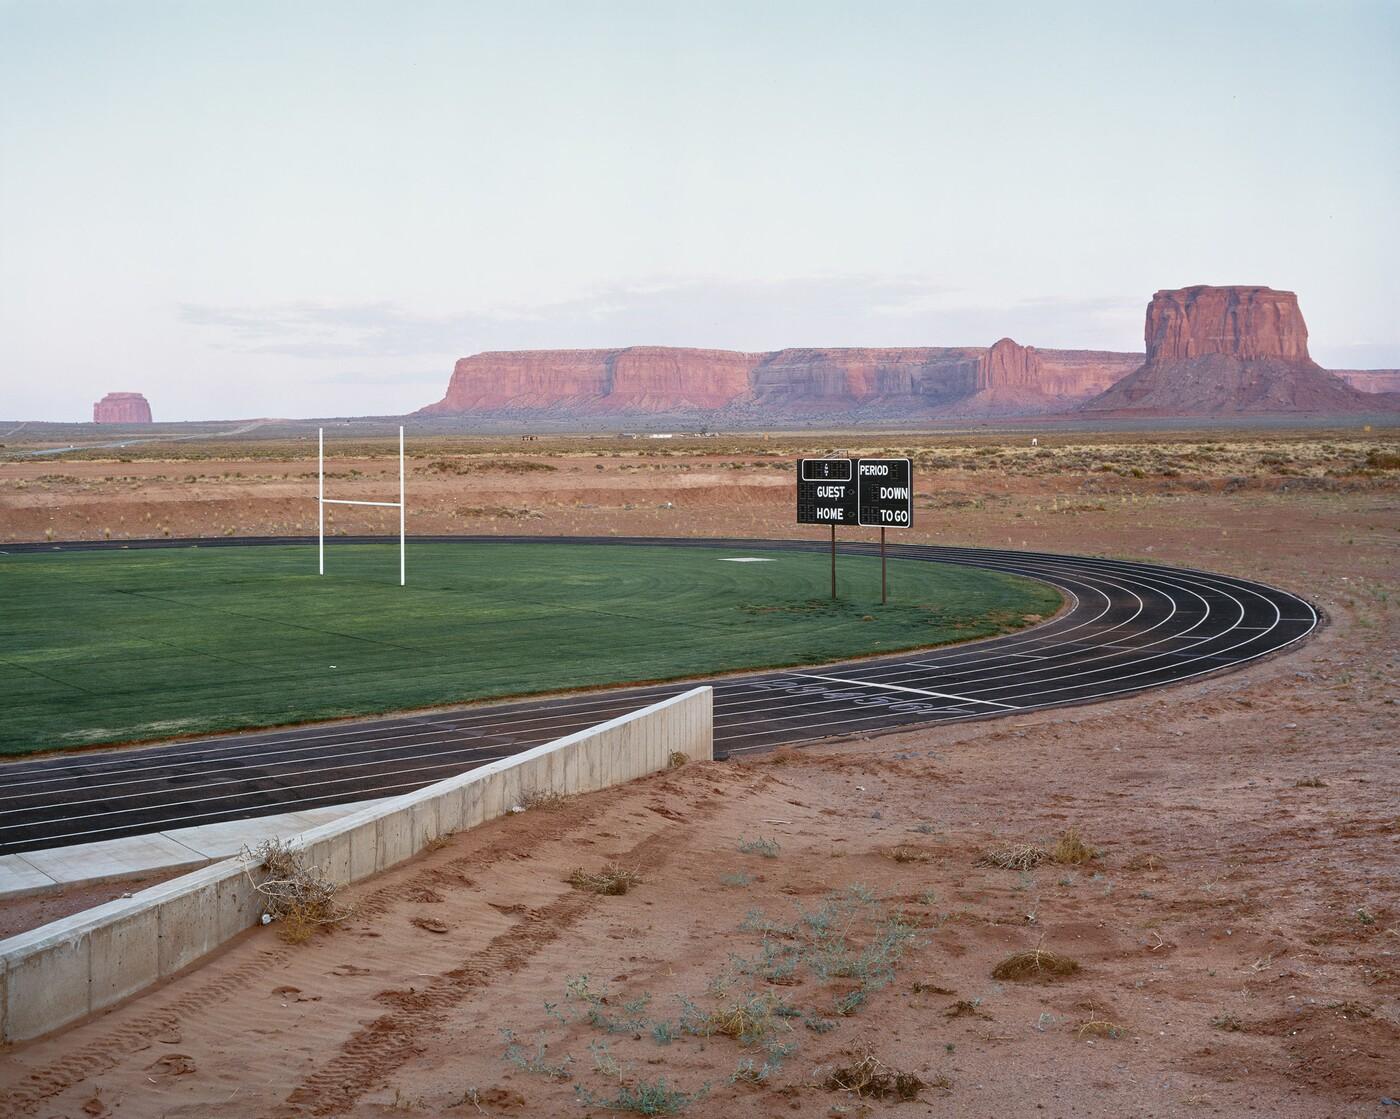 Skeet McAuley (b. 1951), Navajo Monument Valley Tribal School near Goulding, Utah, 1986, Dye destruction print